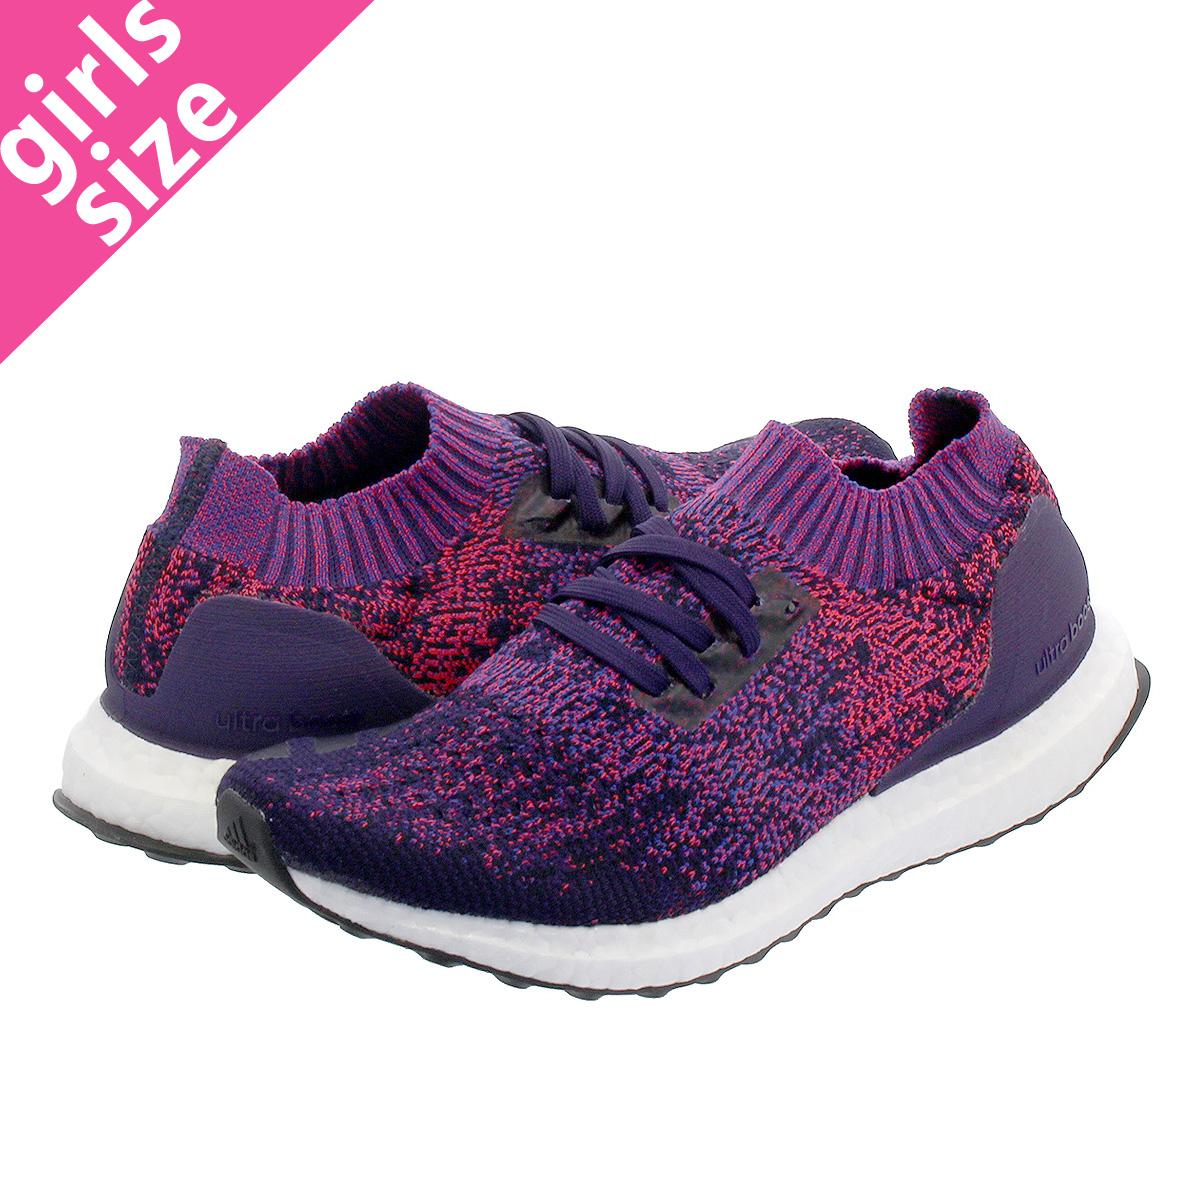 on sale 1ba8d 45282 adidas ULTRA BOOST UNCAGED W Adidas ultra boost Ann caged W LEGEND  PURPLE/LEGEND PURPLE b75862